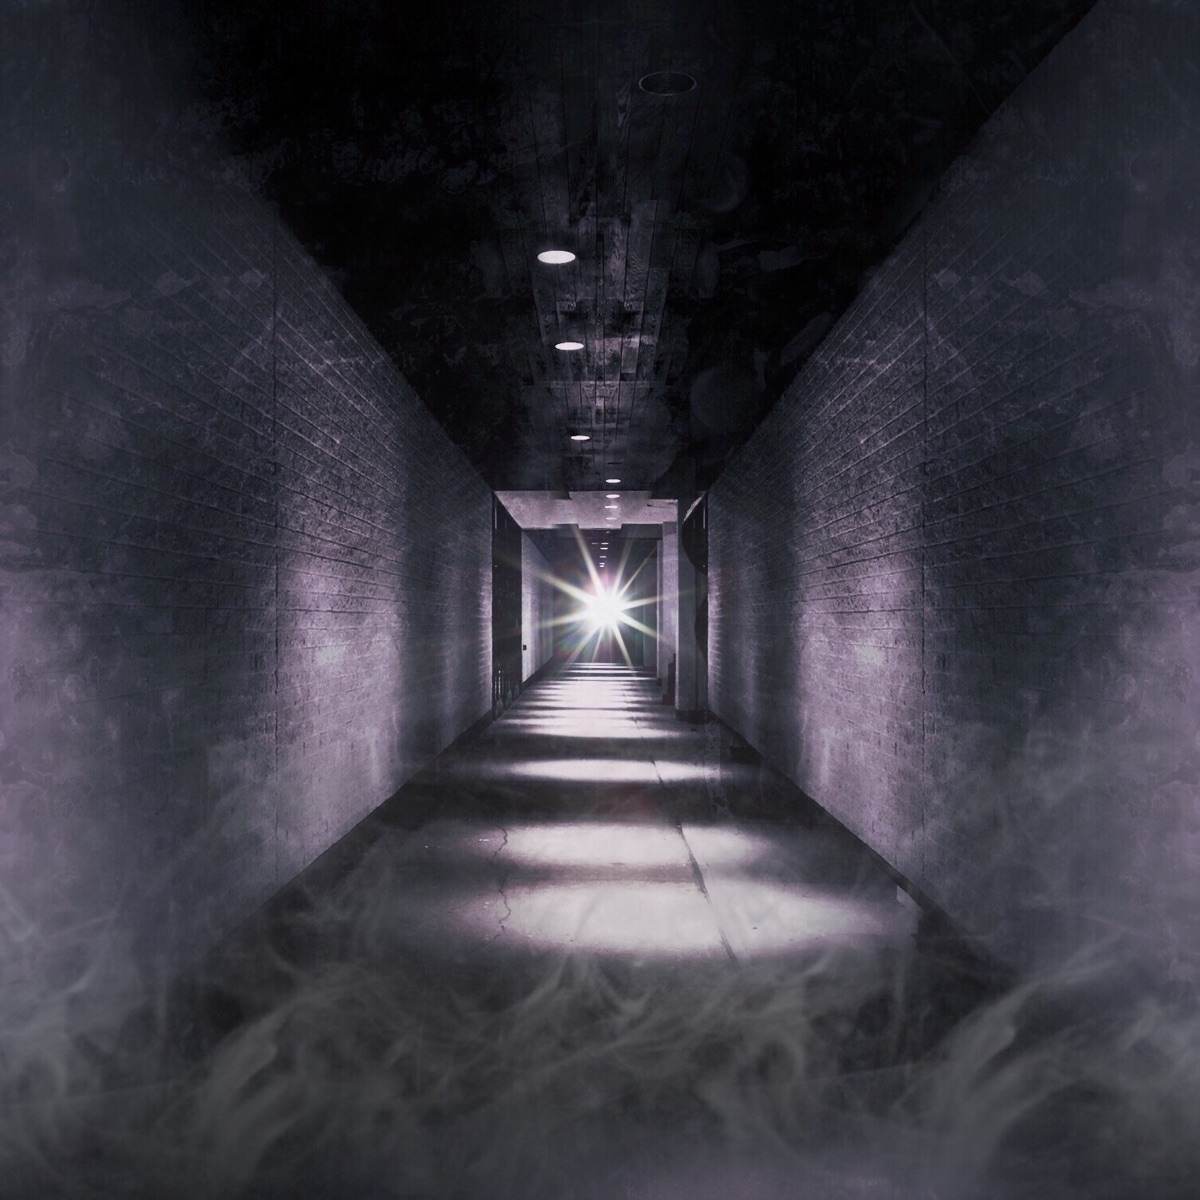 great escape art iPhoneography  - photografia | ello